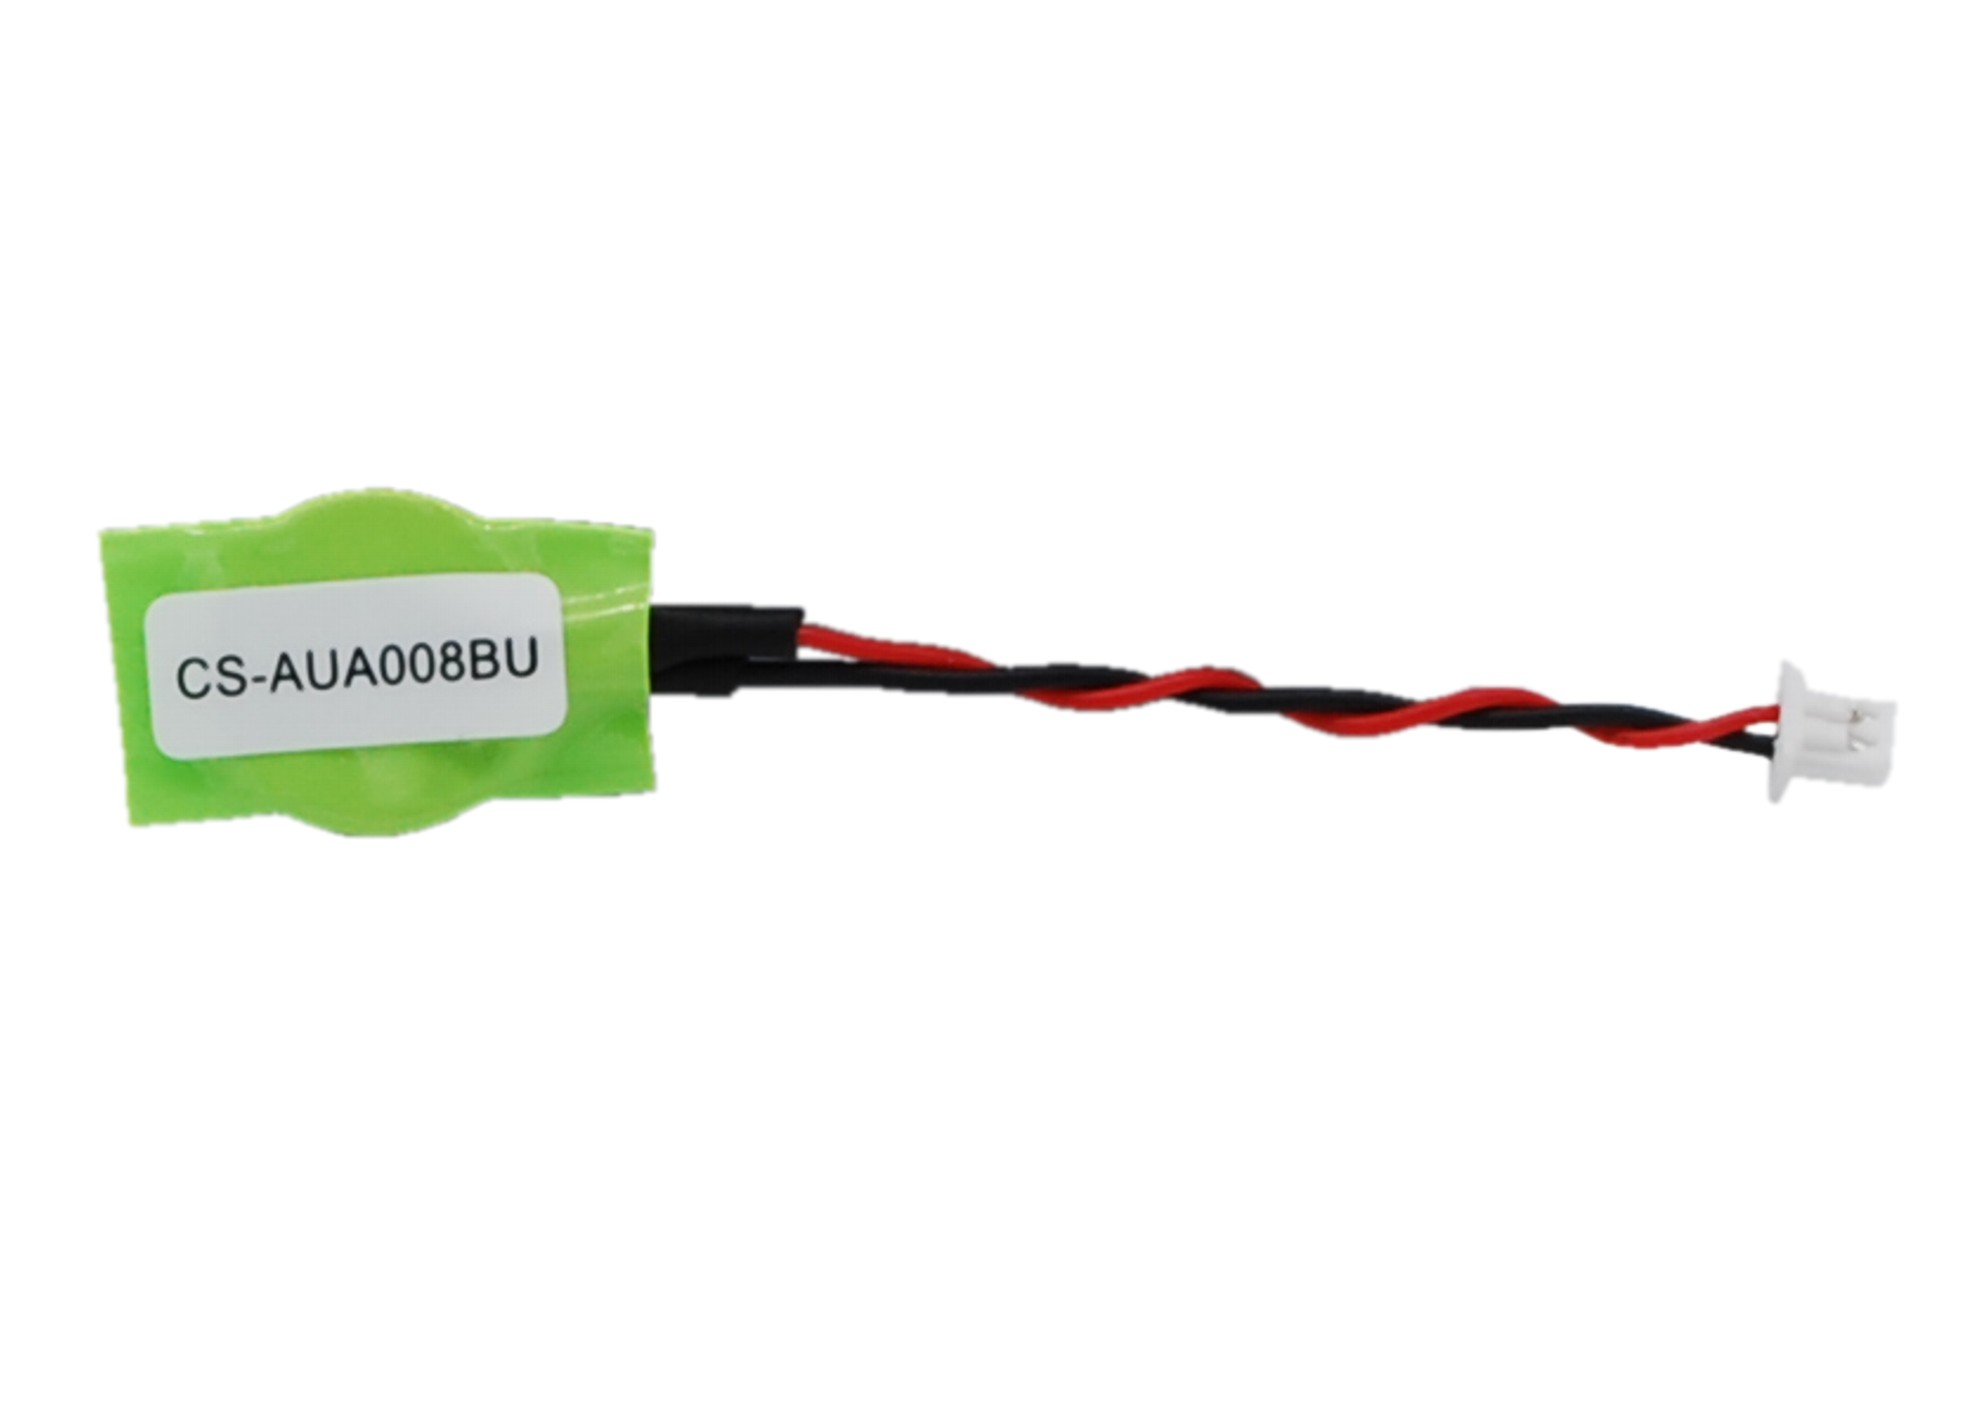 Cameron Sino baterie cmos pro ASUS Eee PC 1005HA-EU1X-BK 3V Li-ion 40mAh zelená - neoriginální